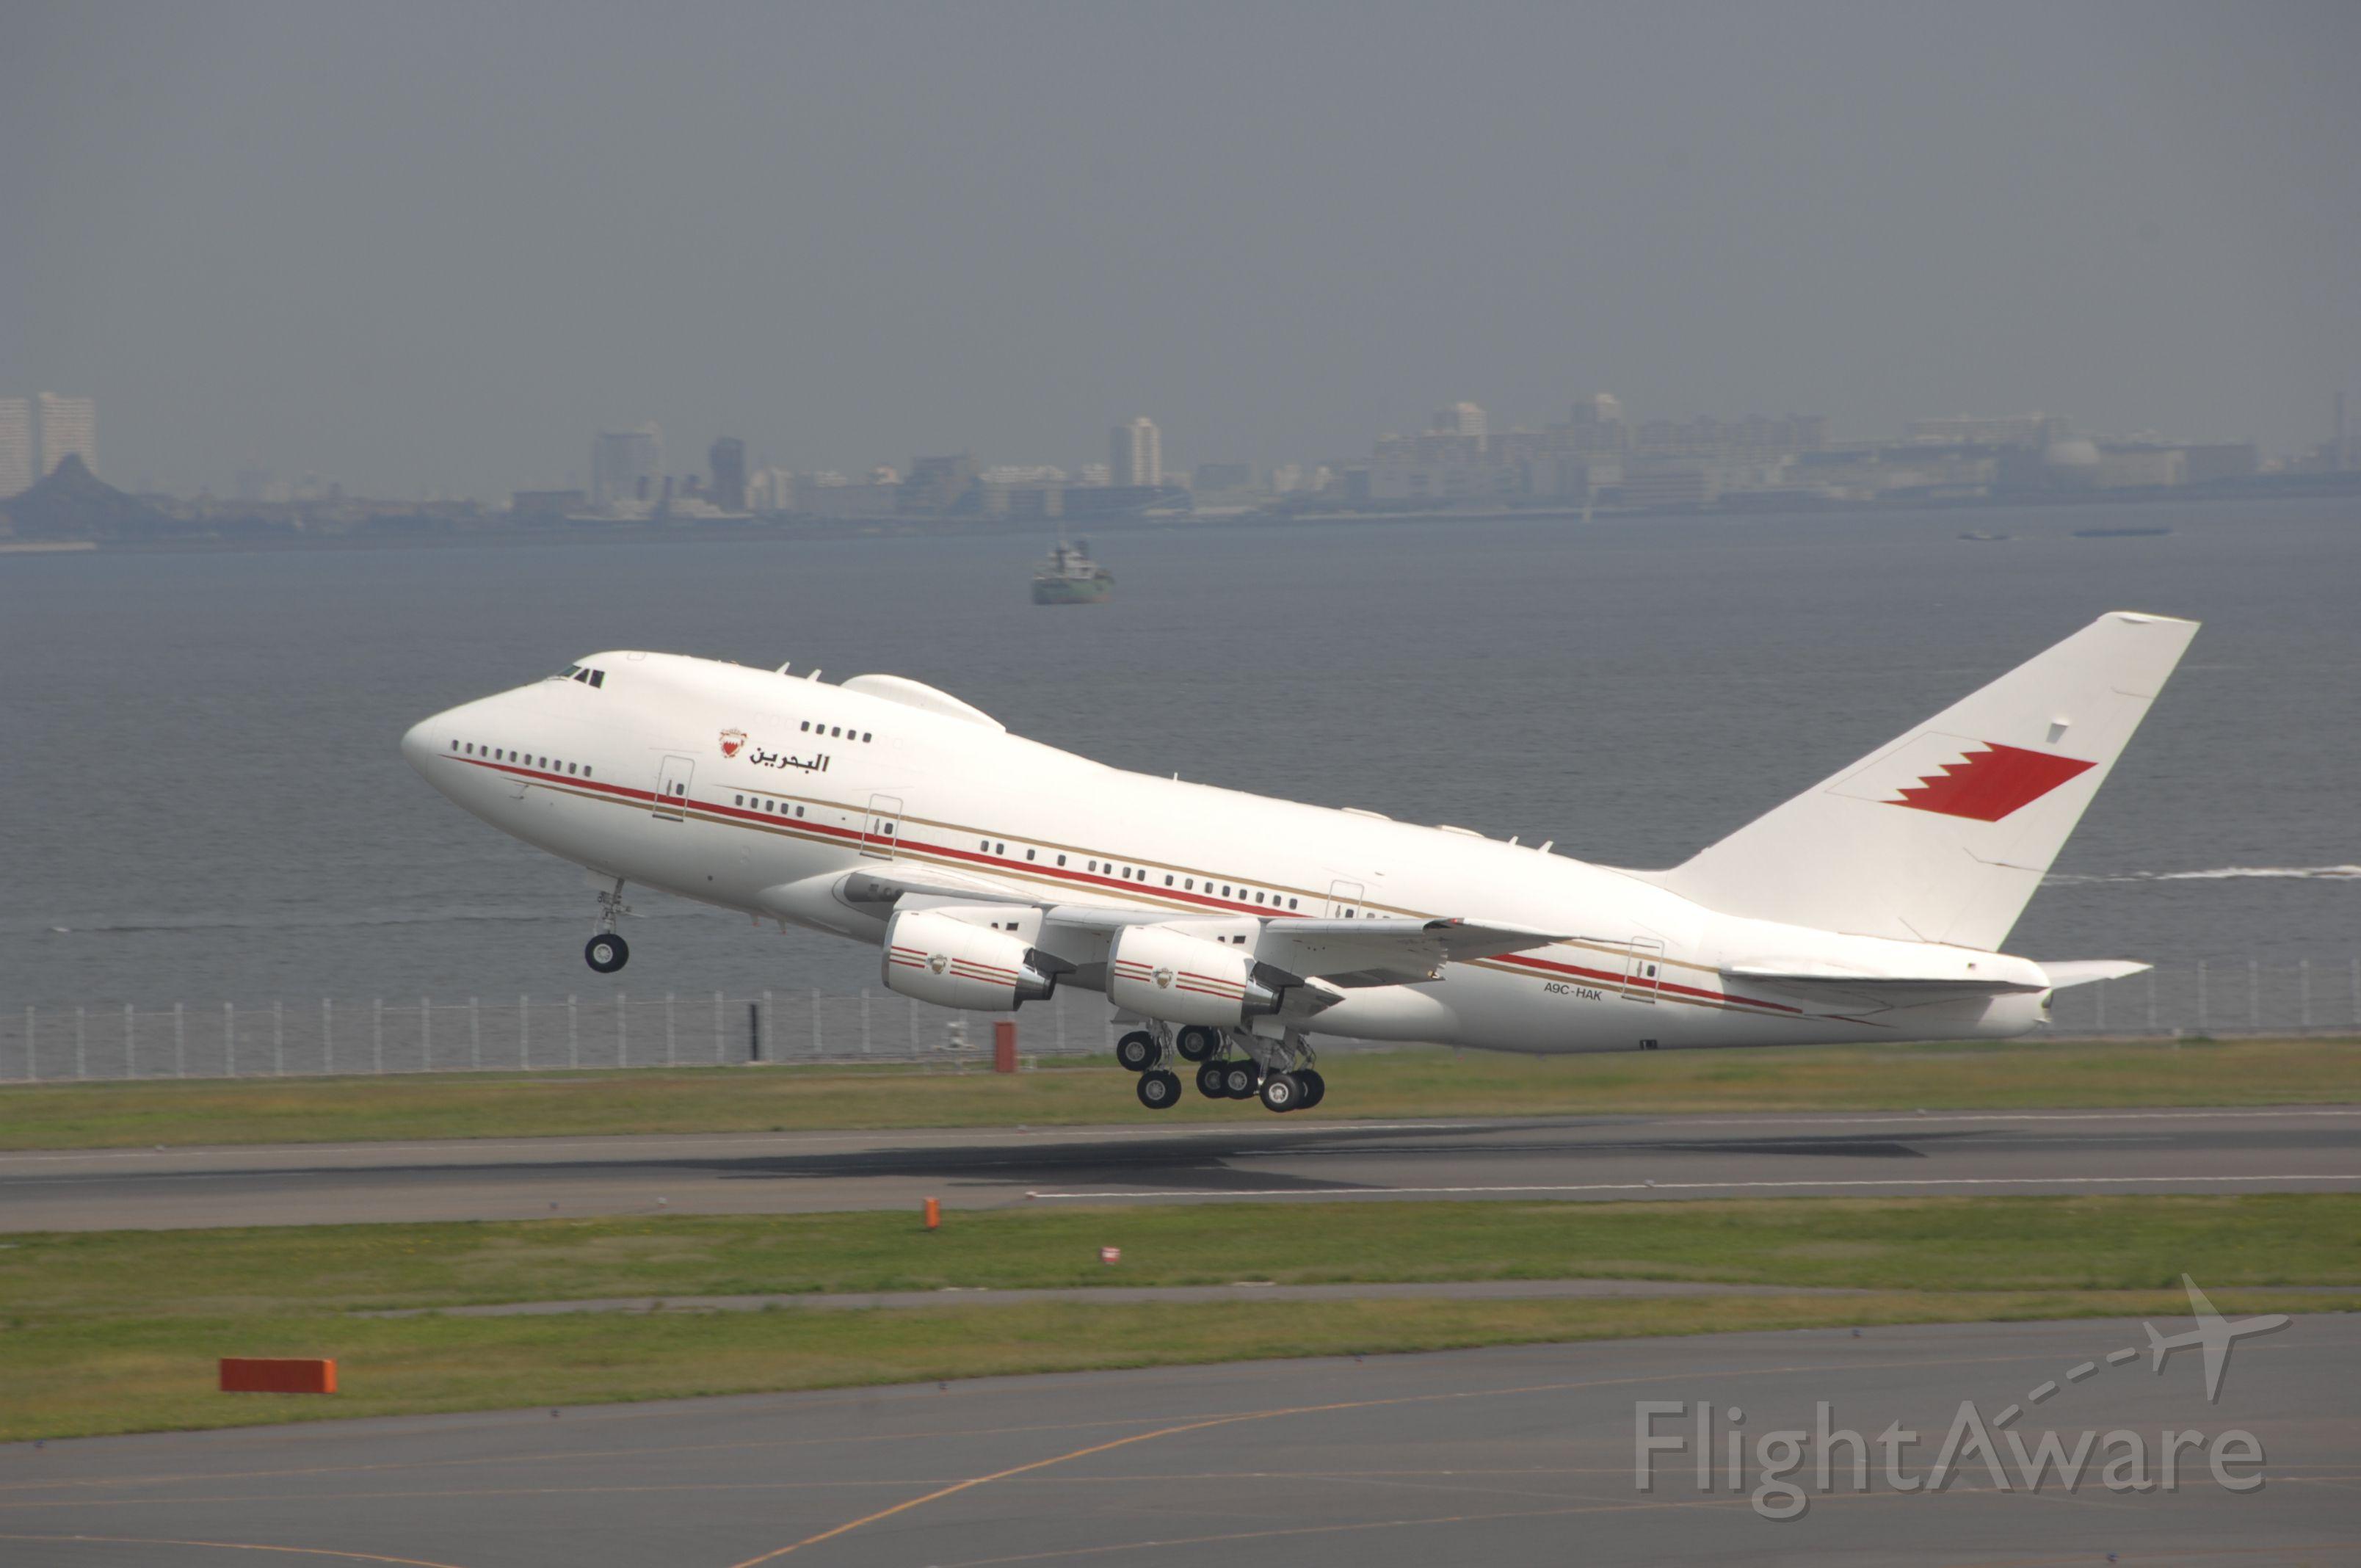 A9C-HAK — - Departure at Haneda Intl Airport R/W34R on 2008/10/13 Bahrain Royal Flight